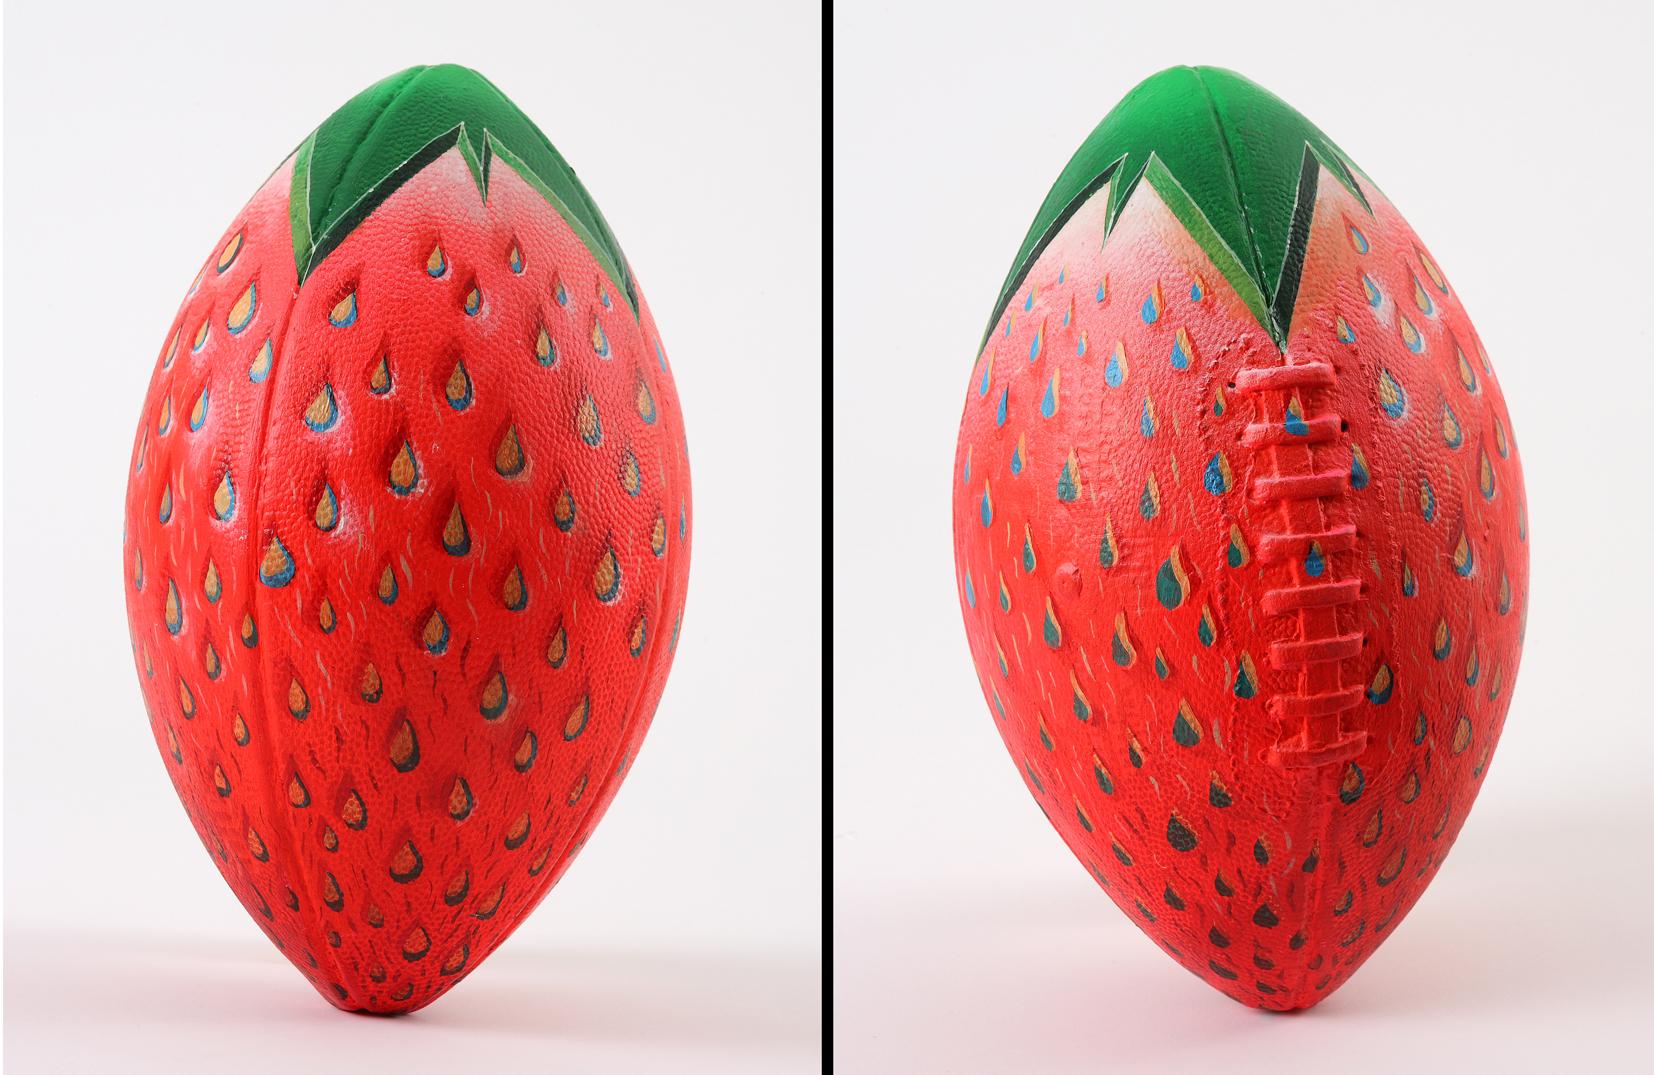 Strawberry Football